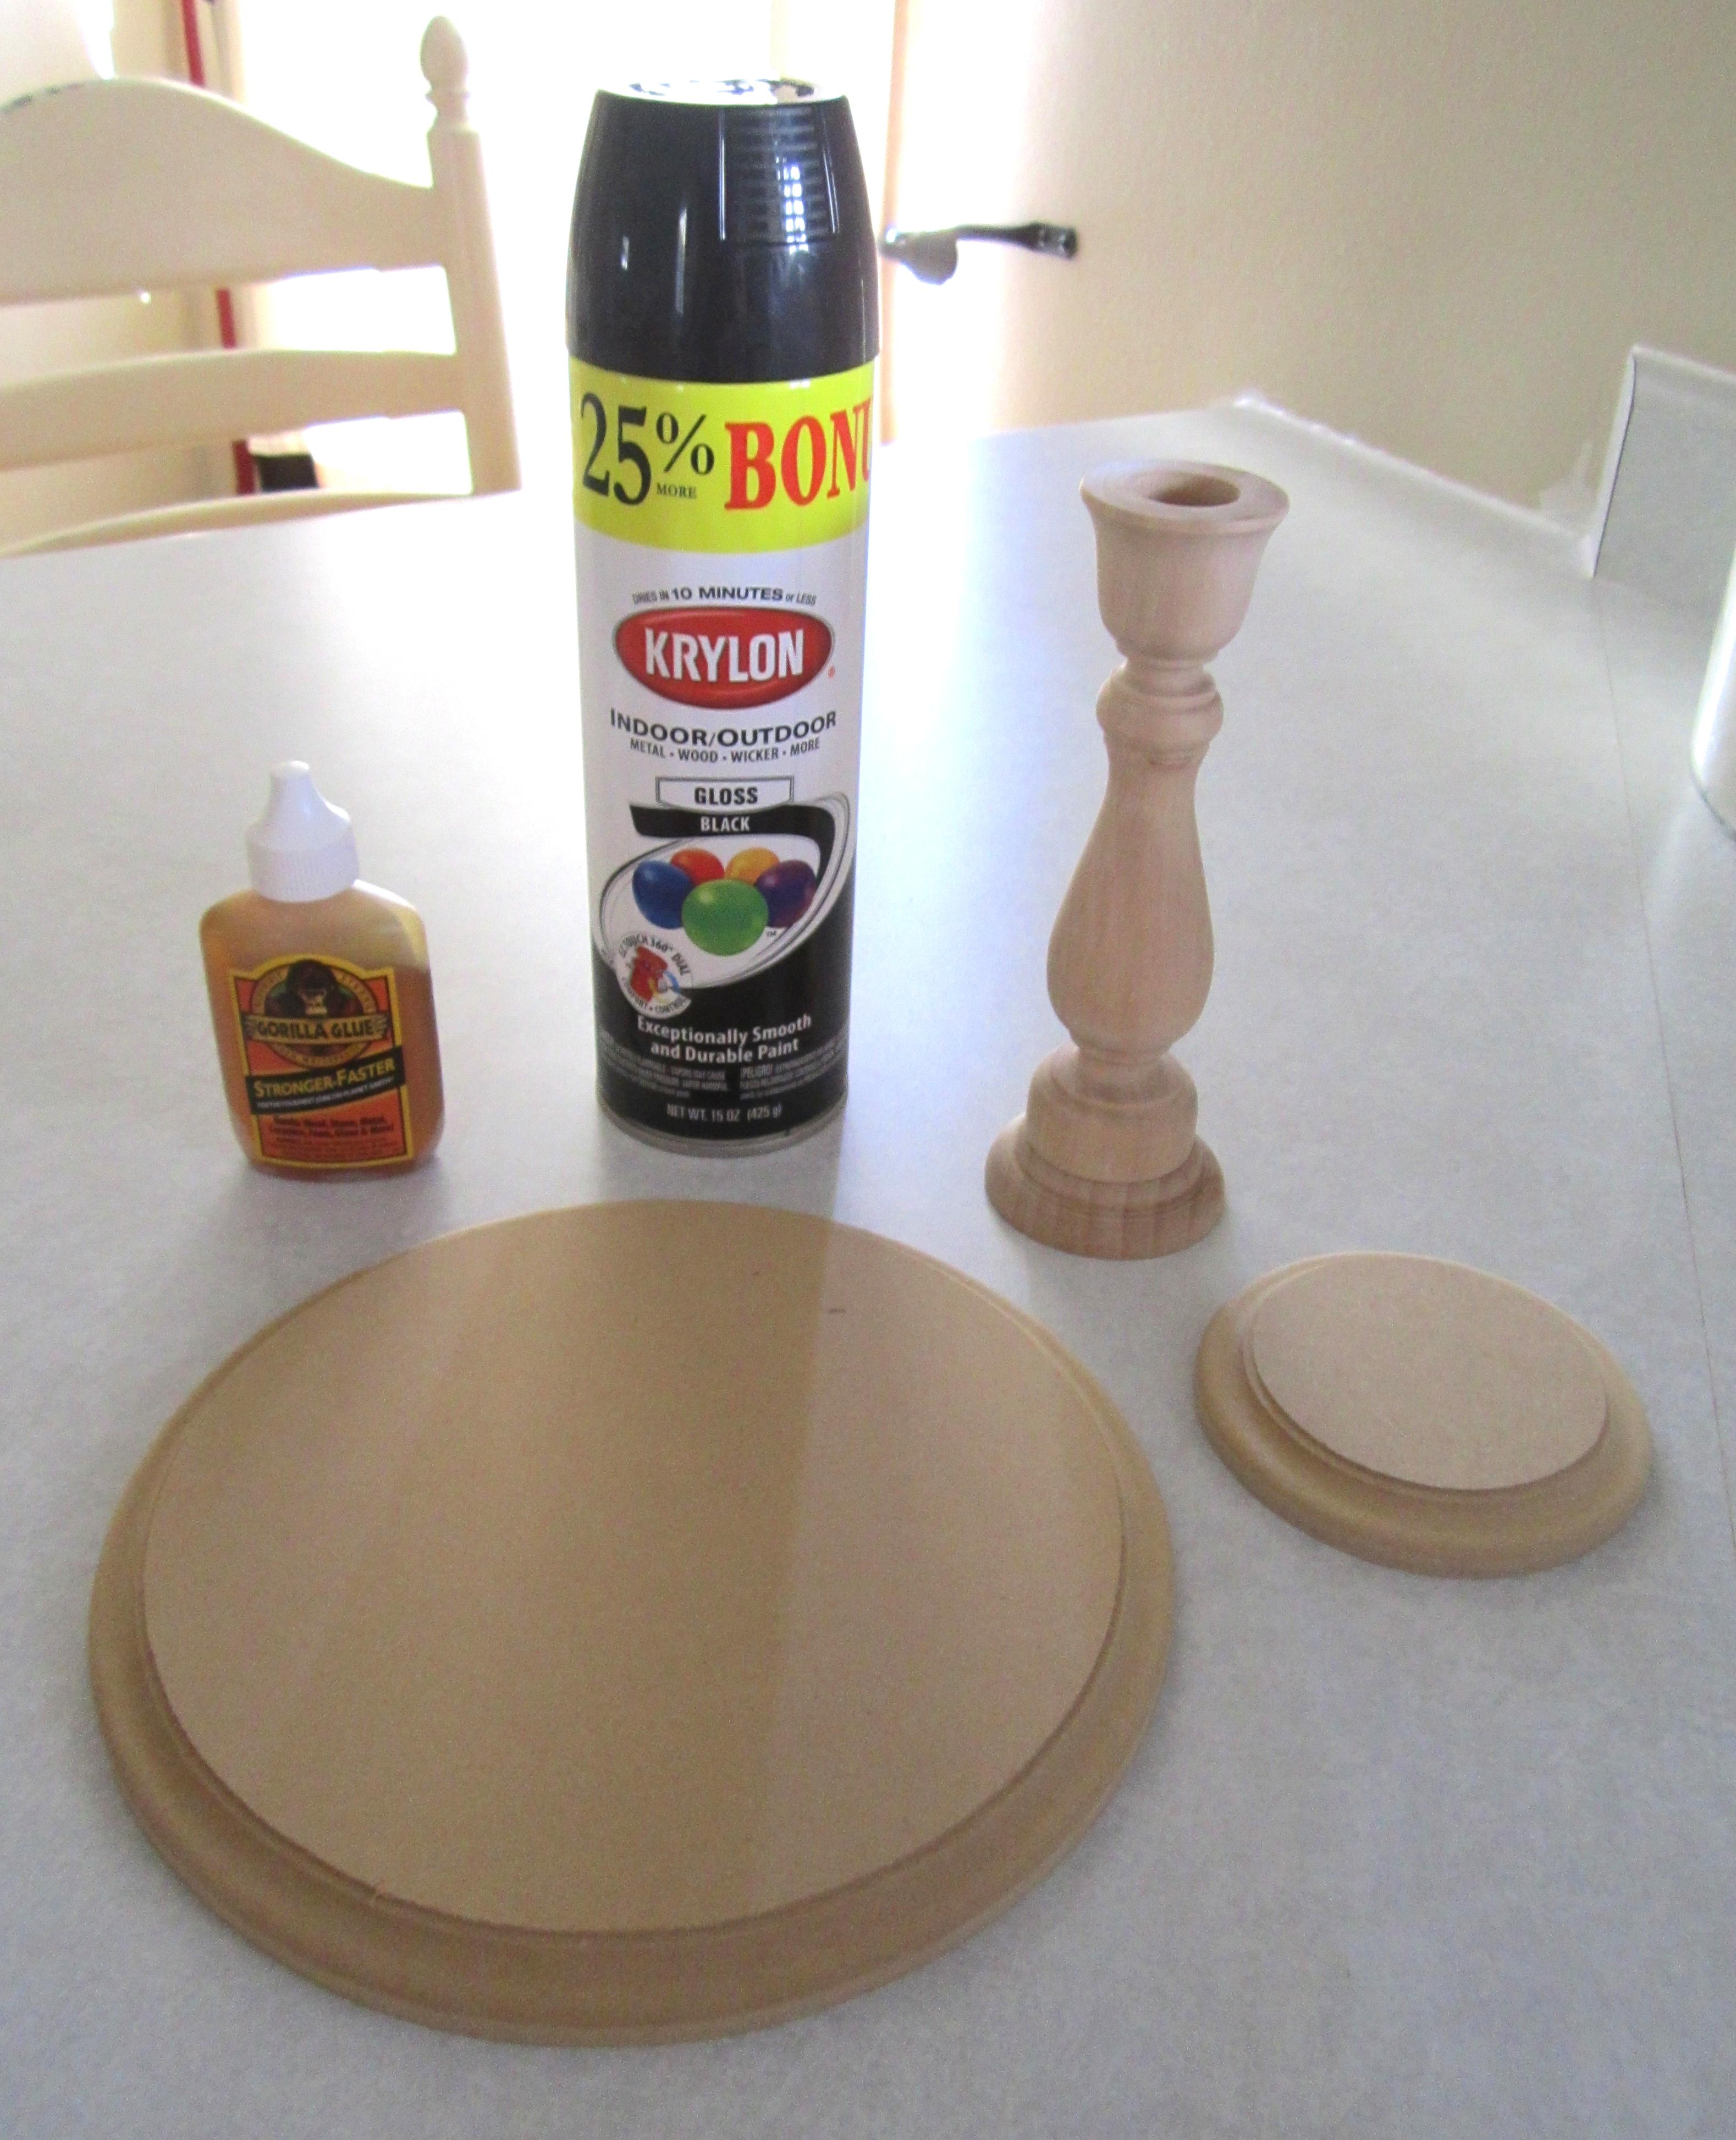 Wooden Cake Stand Diy Ideas & Wooden Cake Stand Diy - DIY Ideas